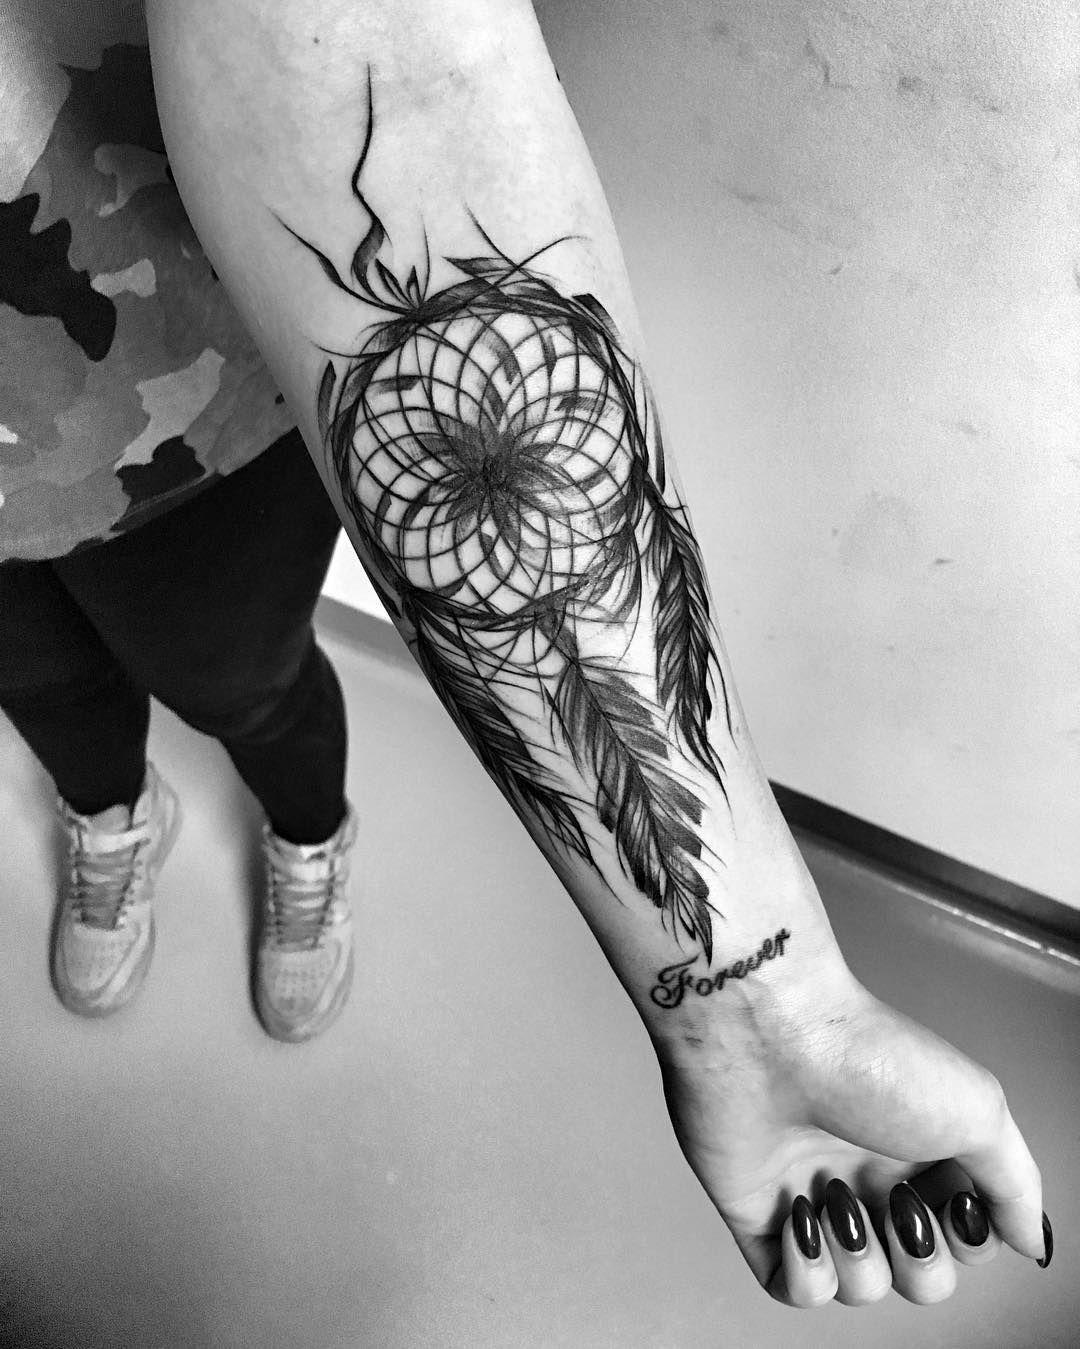 Sketch Style Dreamcatcher Action Disenos De Tatuajes De Arcos Tatuajes Chiquitos Brazos Tatuados